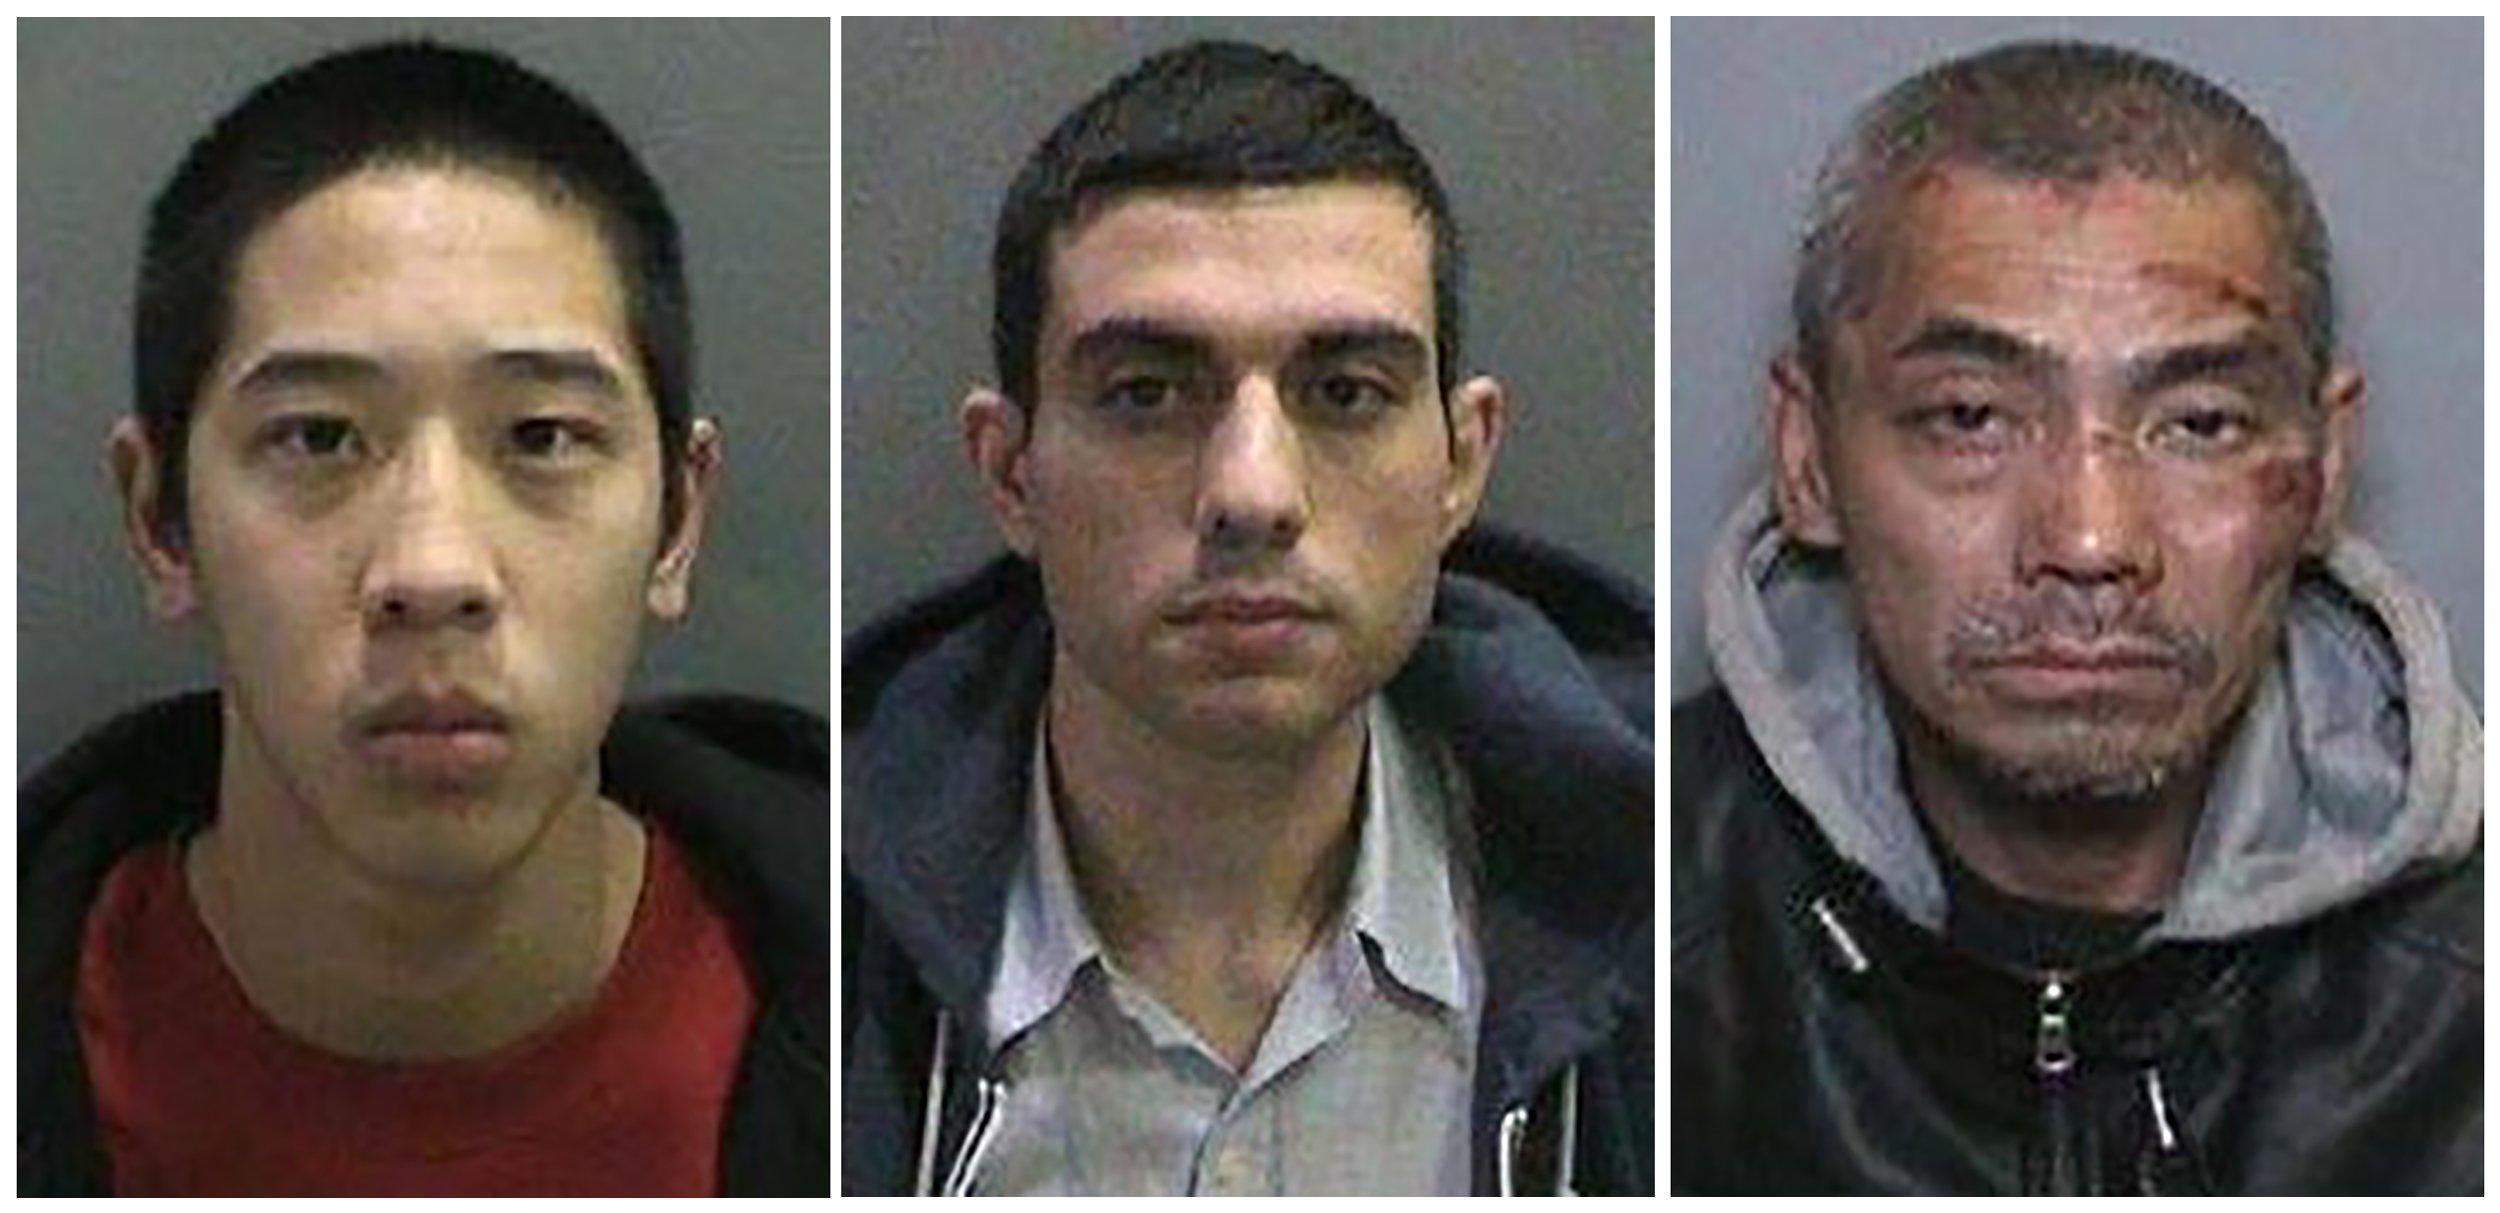 0130_california_jail_escapees